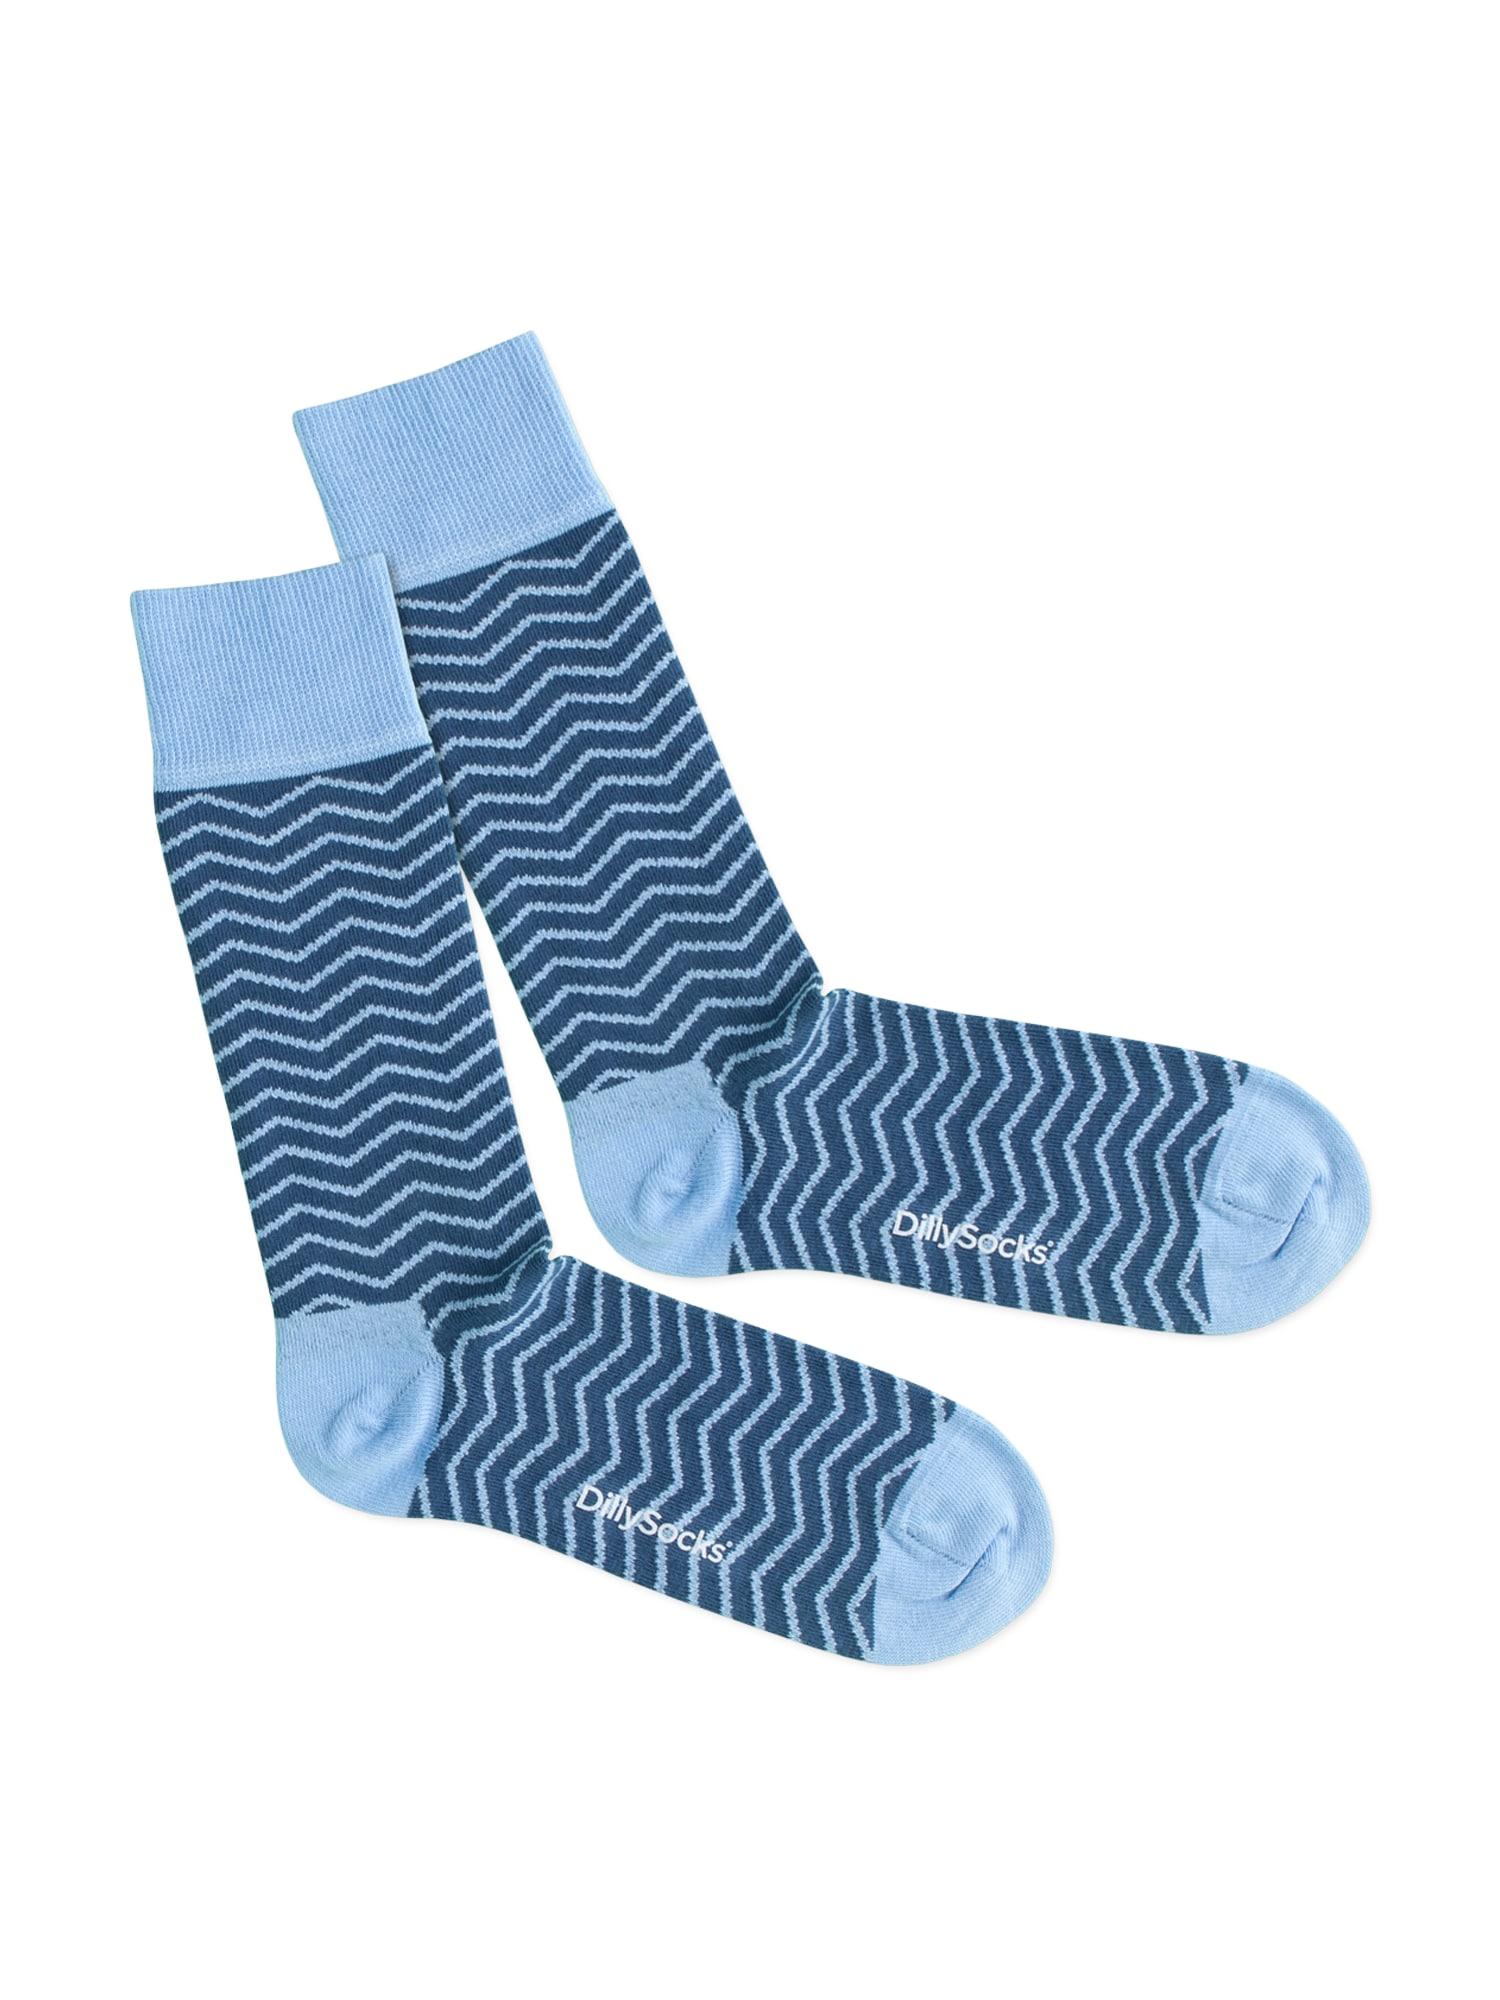 DillySocks Kojinės 'Square Wave' mėlyna / šviesiai mėlyna